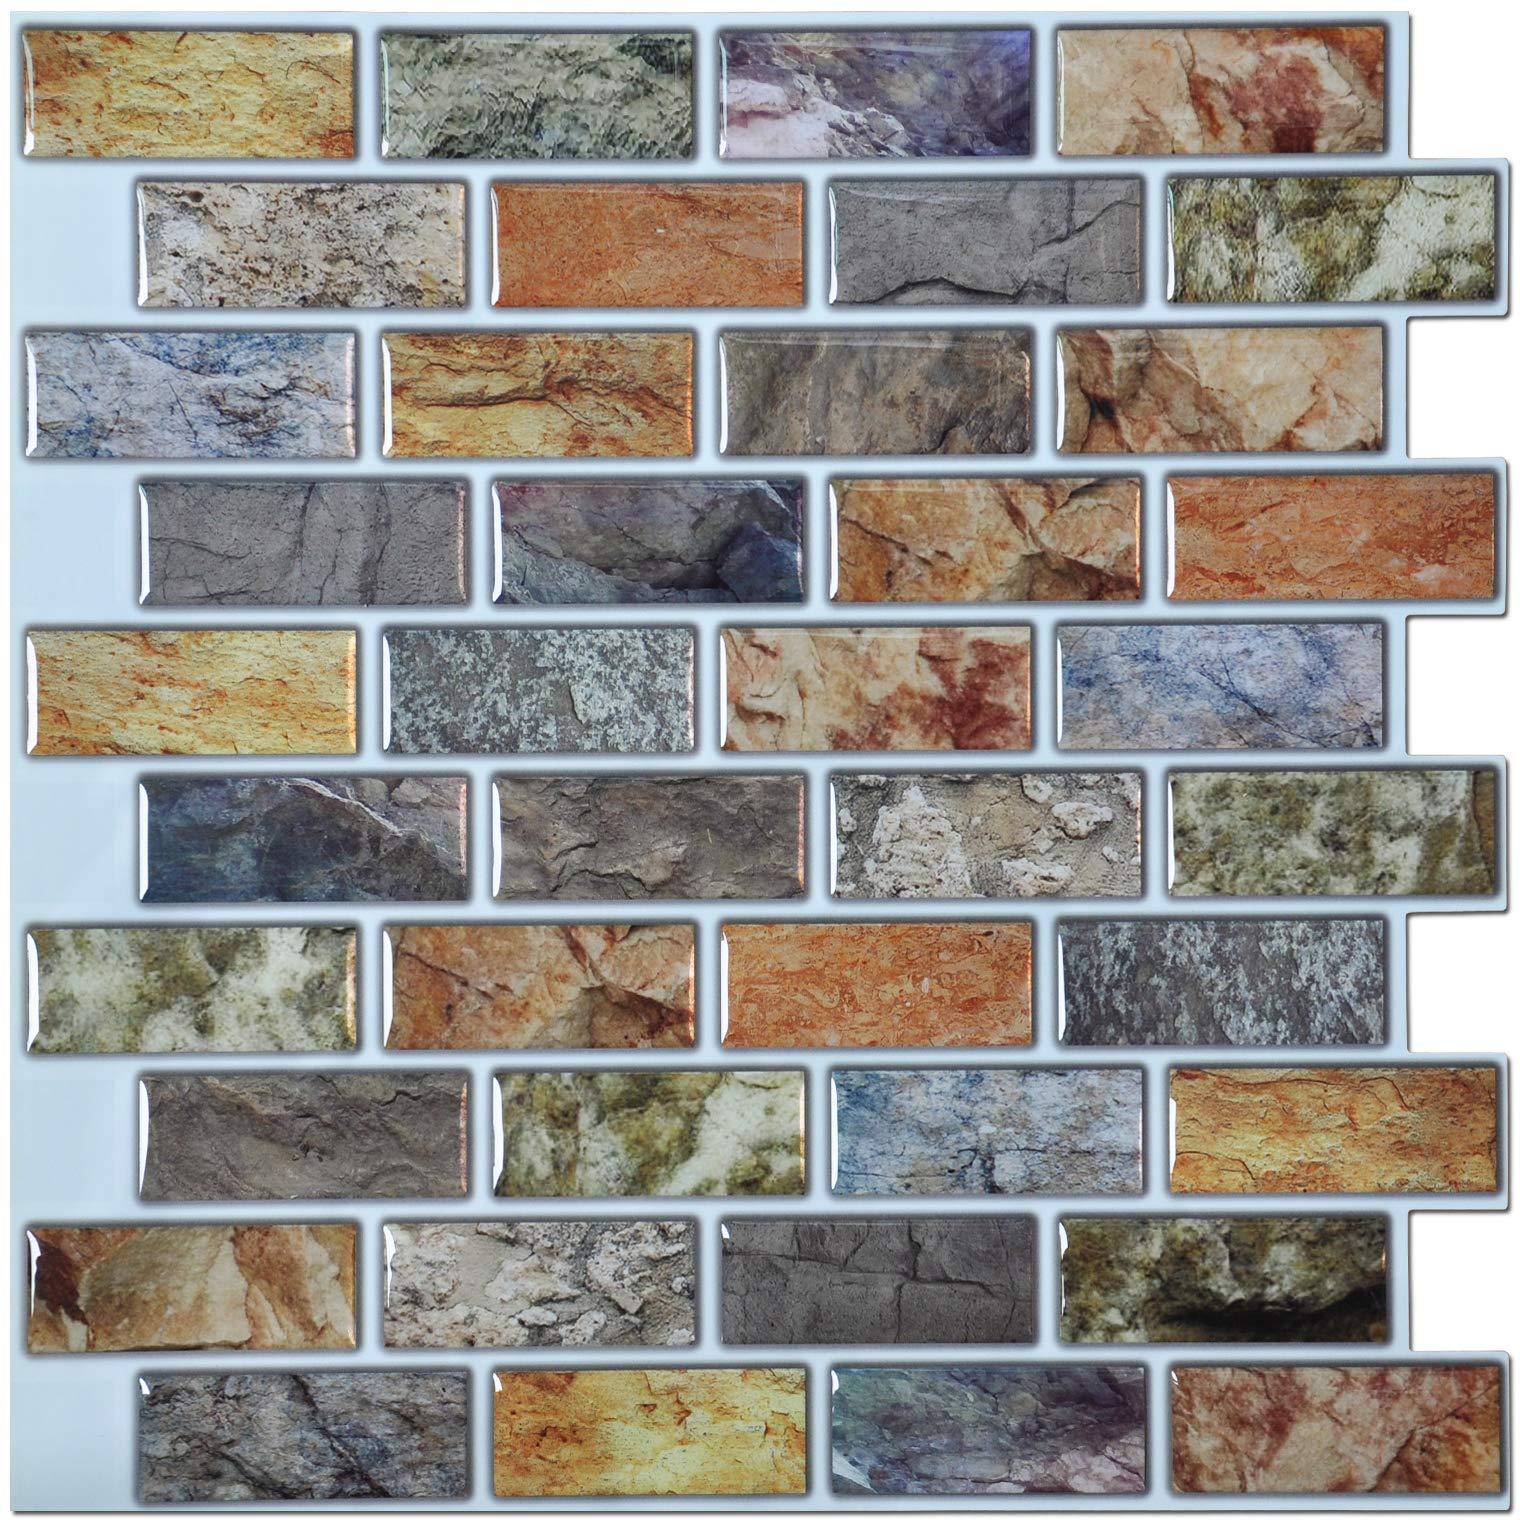 Art3d 10 Piece Peel Stick Kitchen Bathroom Backsplash Sticker 12 X 12 Faux Ceramic Tile Design Amazon Com